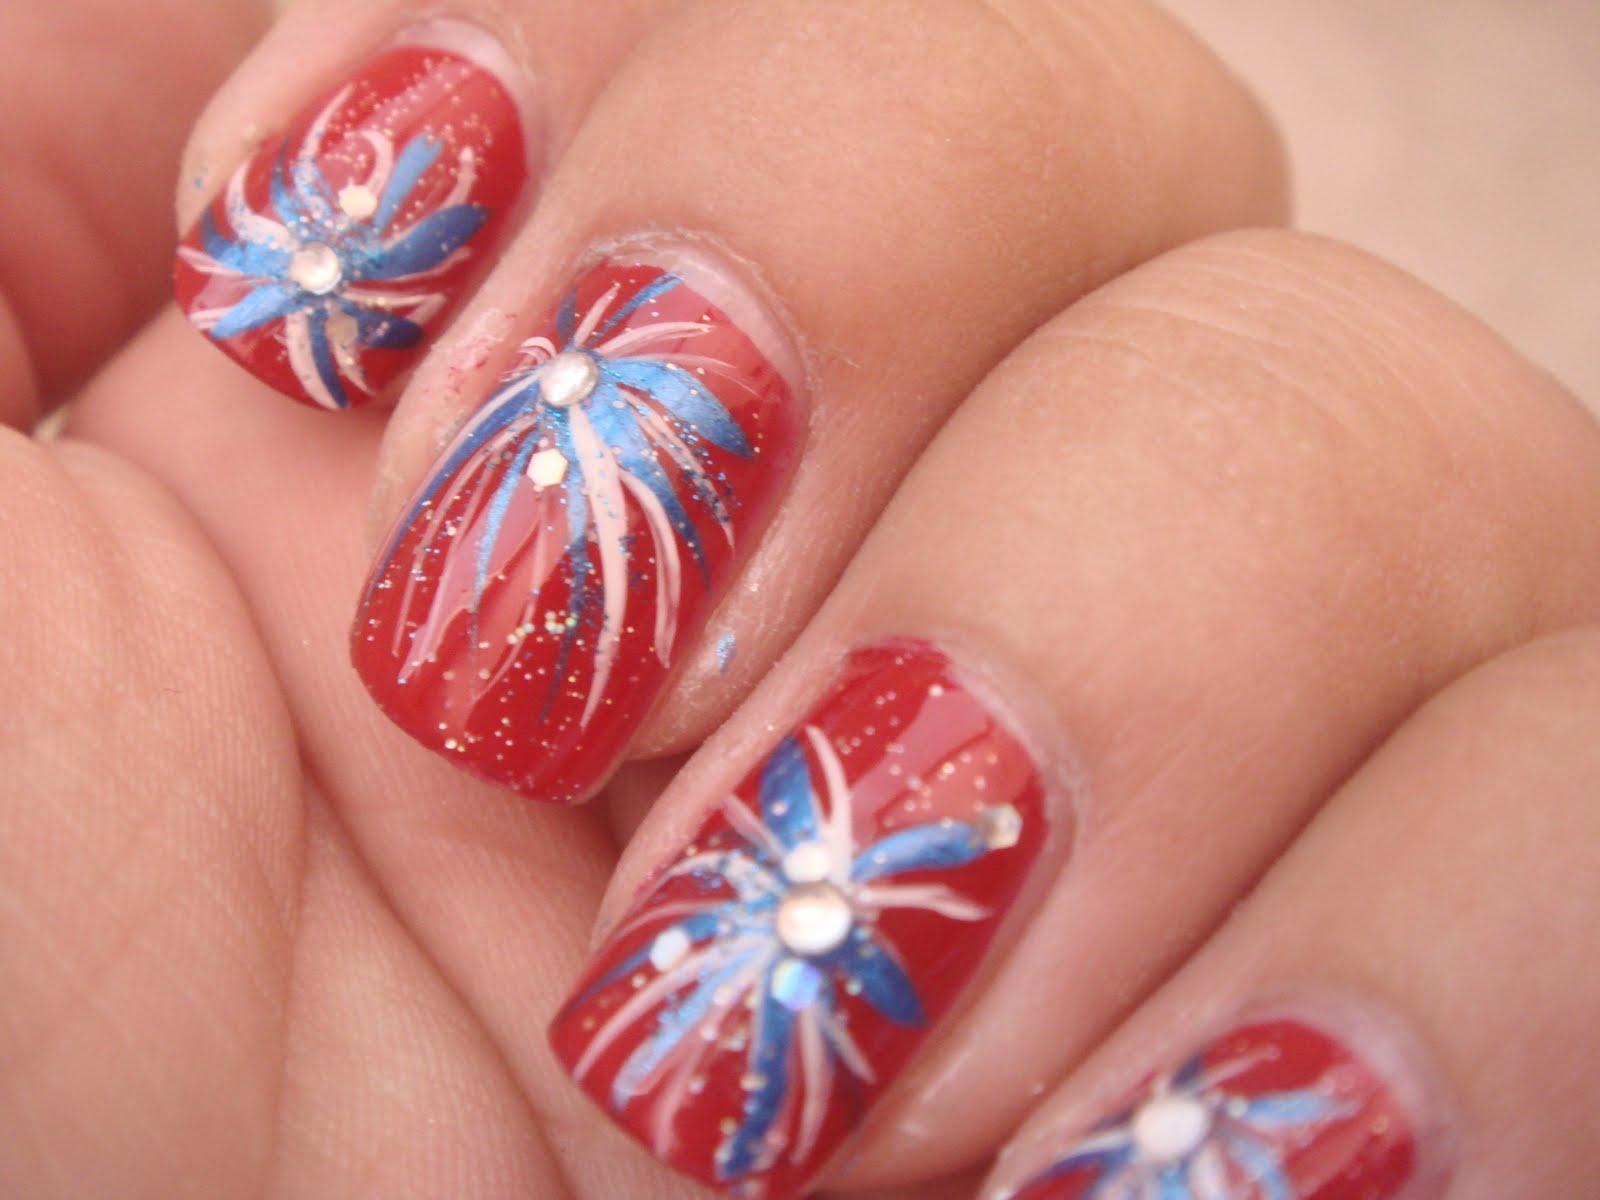 All Nail and Cosmetics: 4th of July Nails!